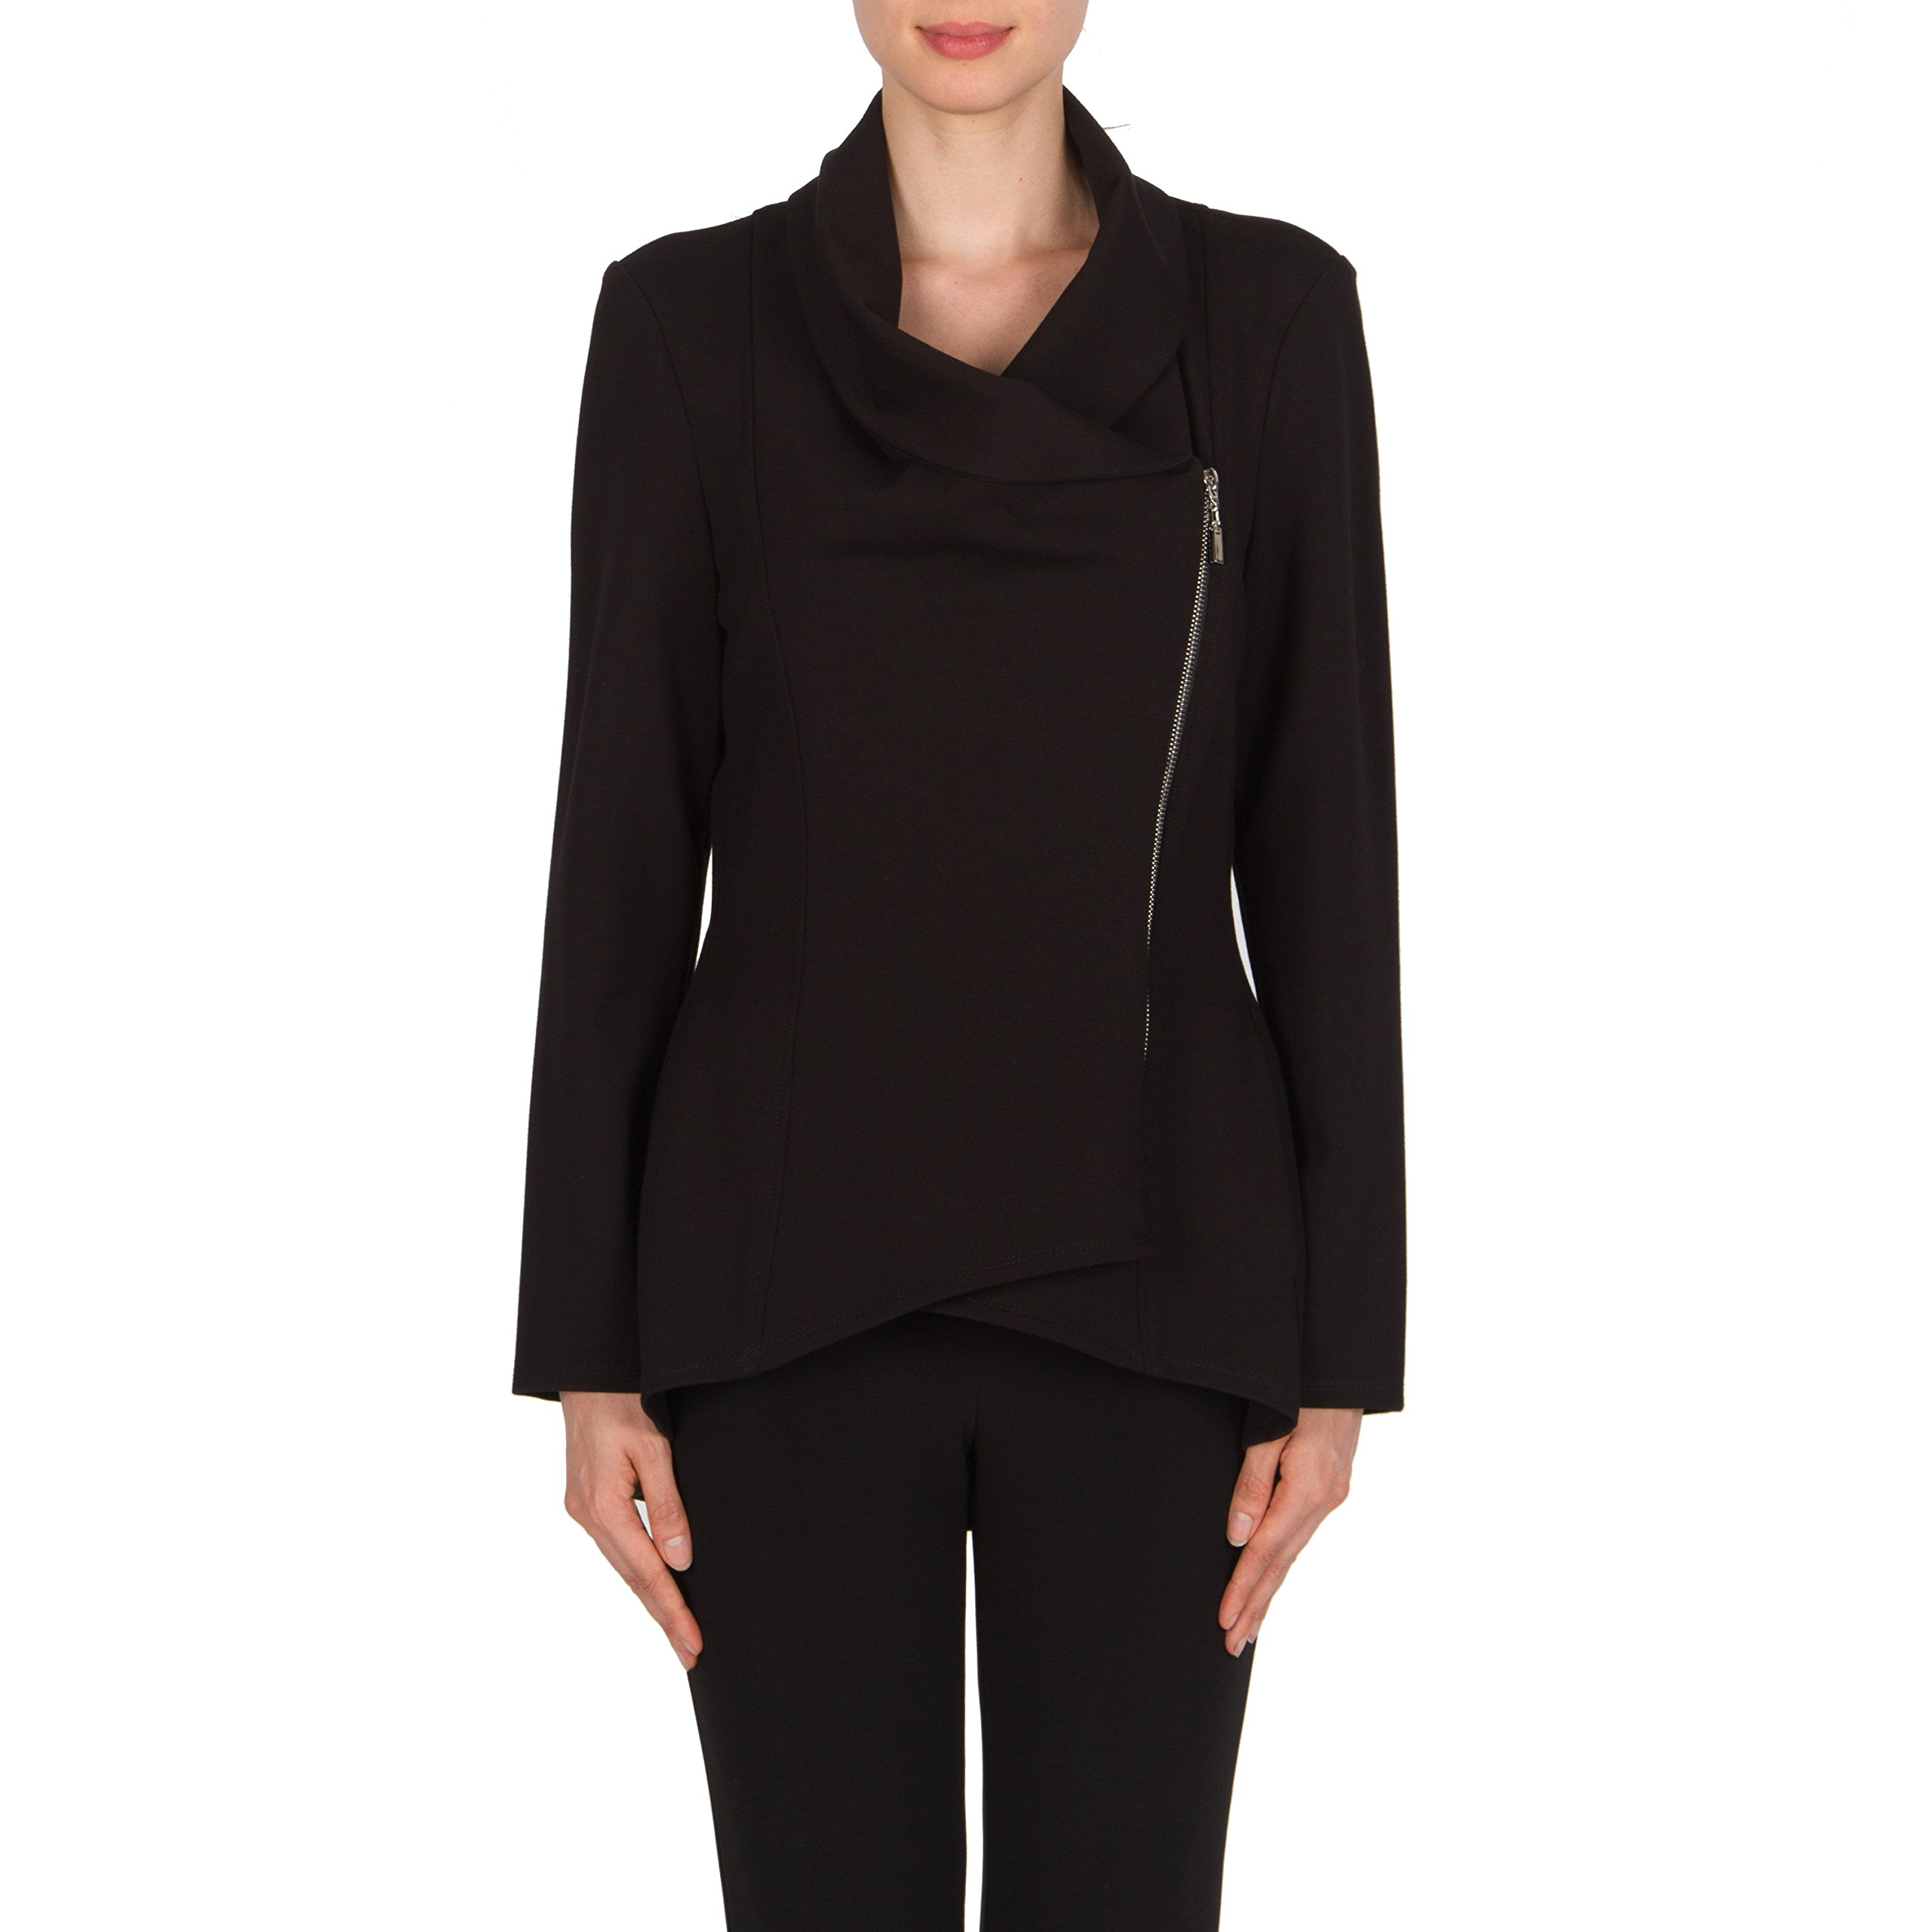 Joseph Ribkoff Tailored Black Peacoat Jacket Style 174306 Size 10 by Joseph Ribkoff